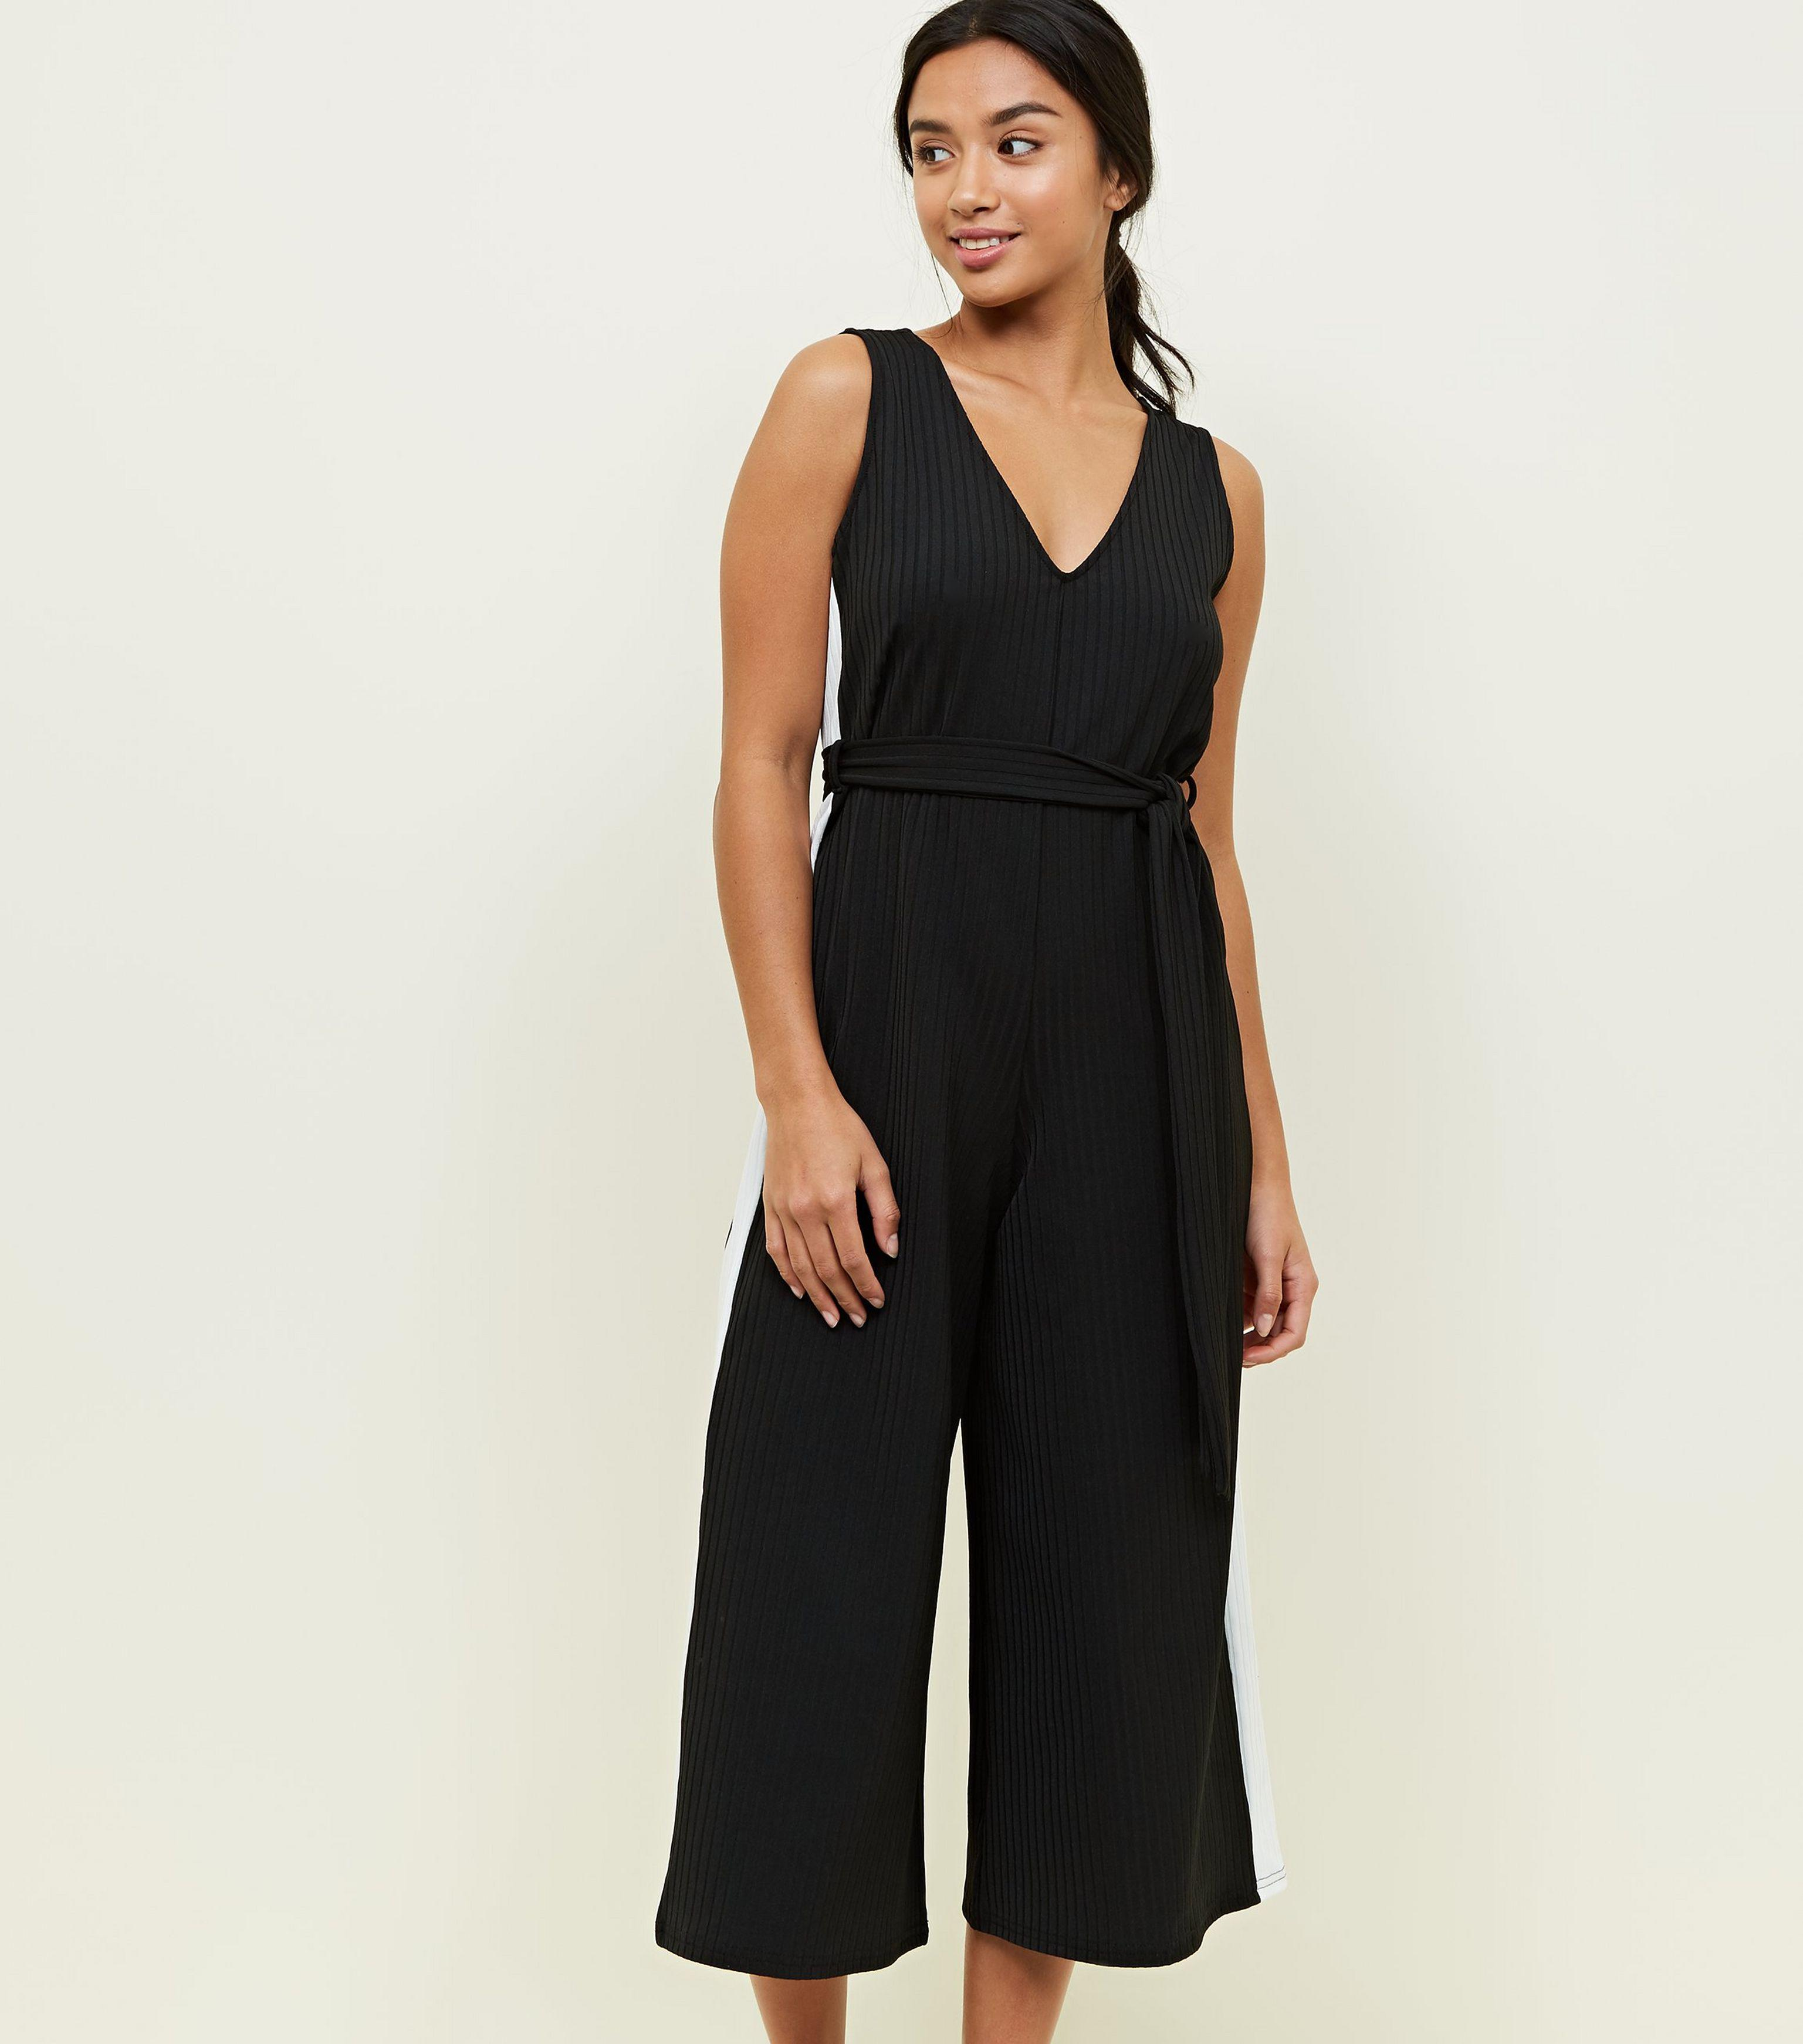 2eea6807cd3b New Look Petite Black Side Stripe Belted Culotte Jumpsuit in Black ...